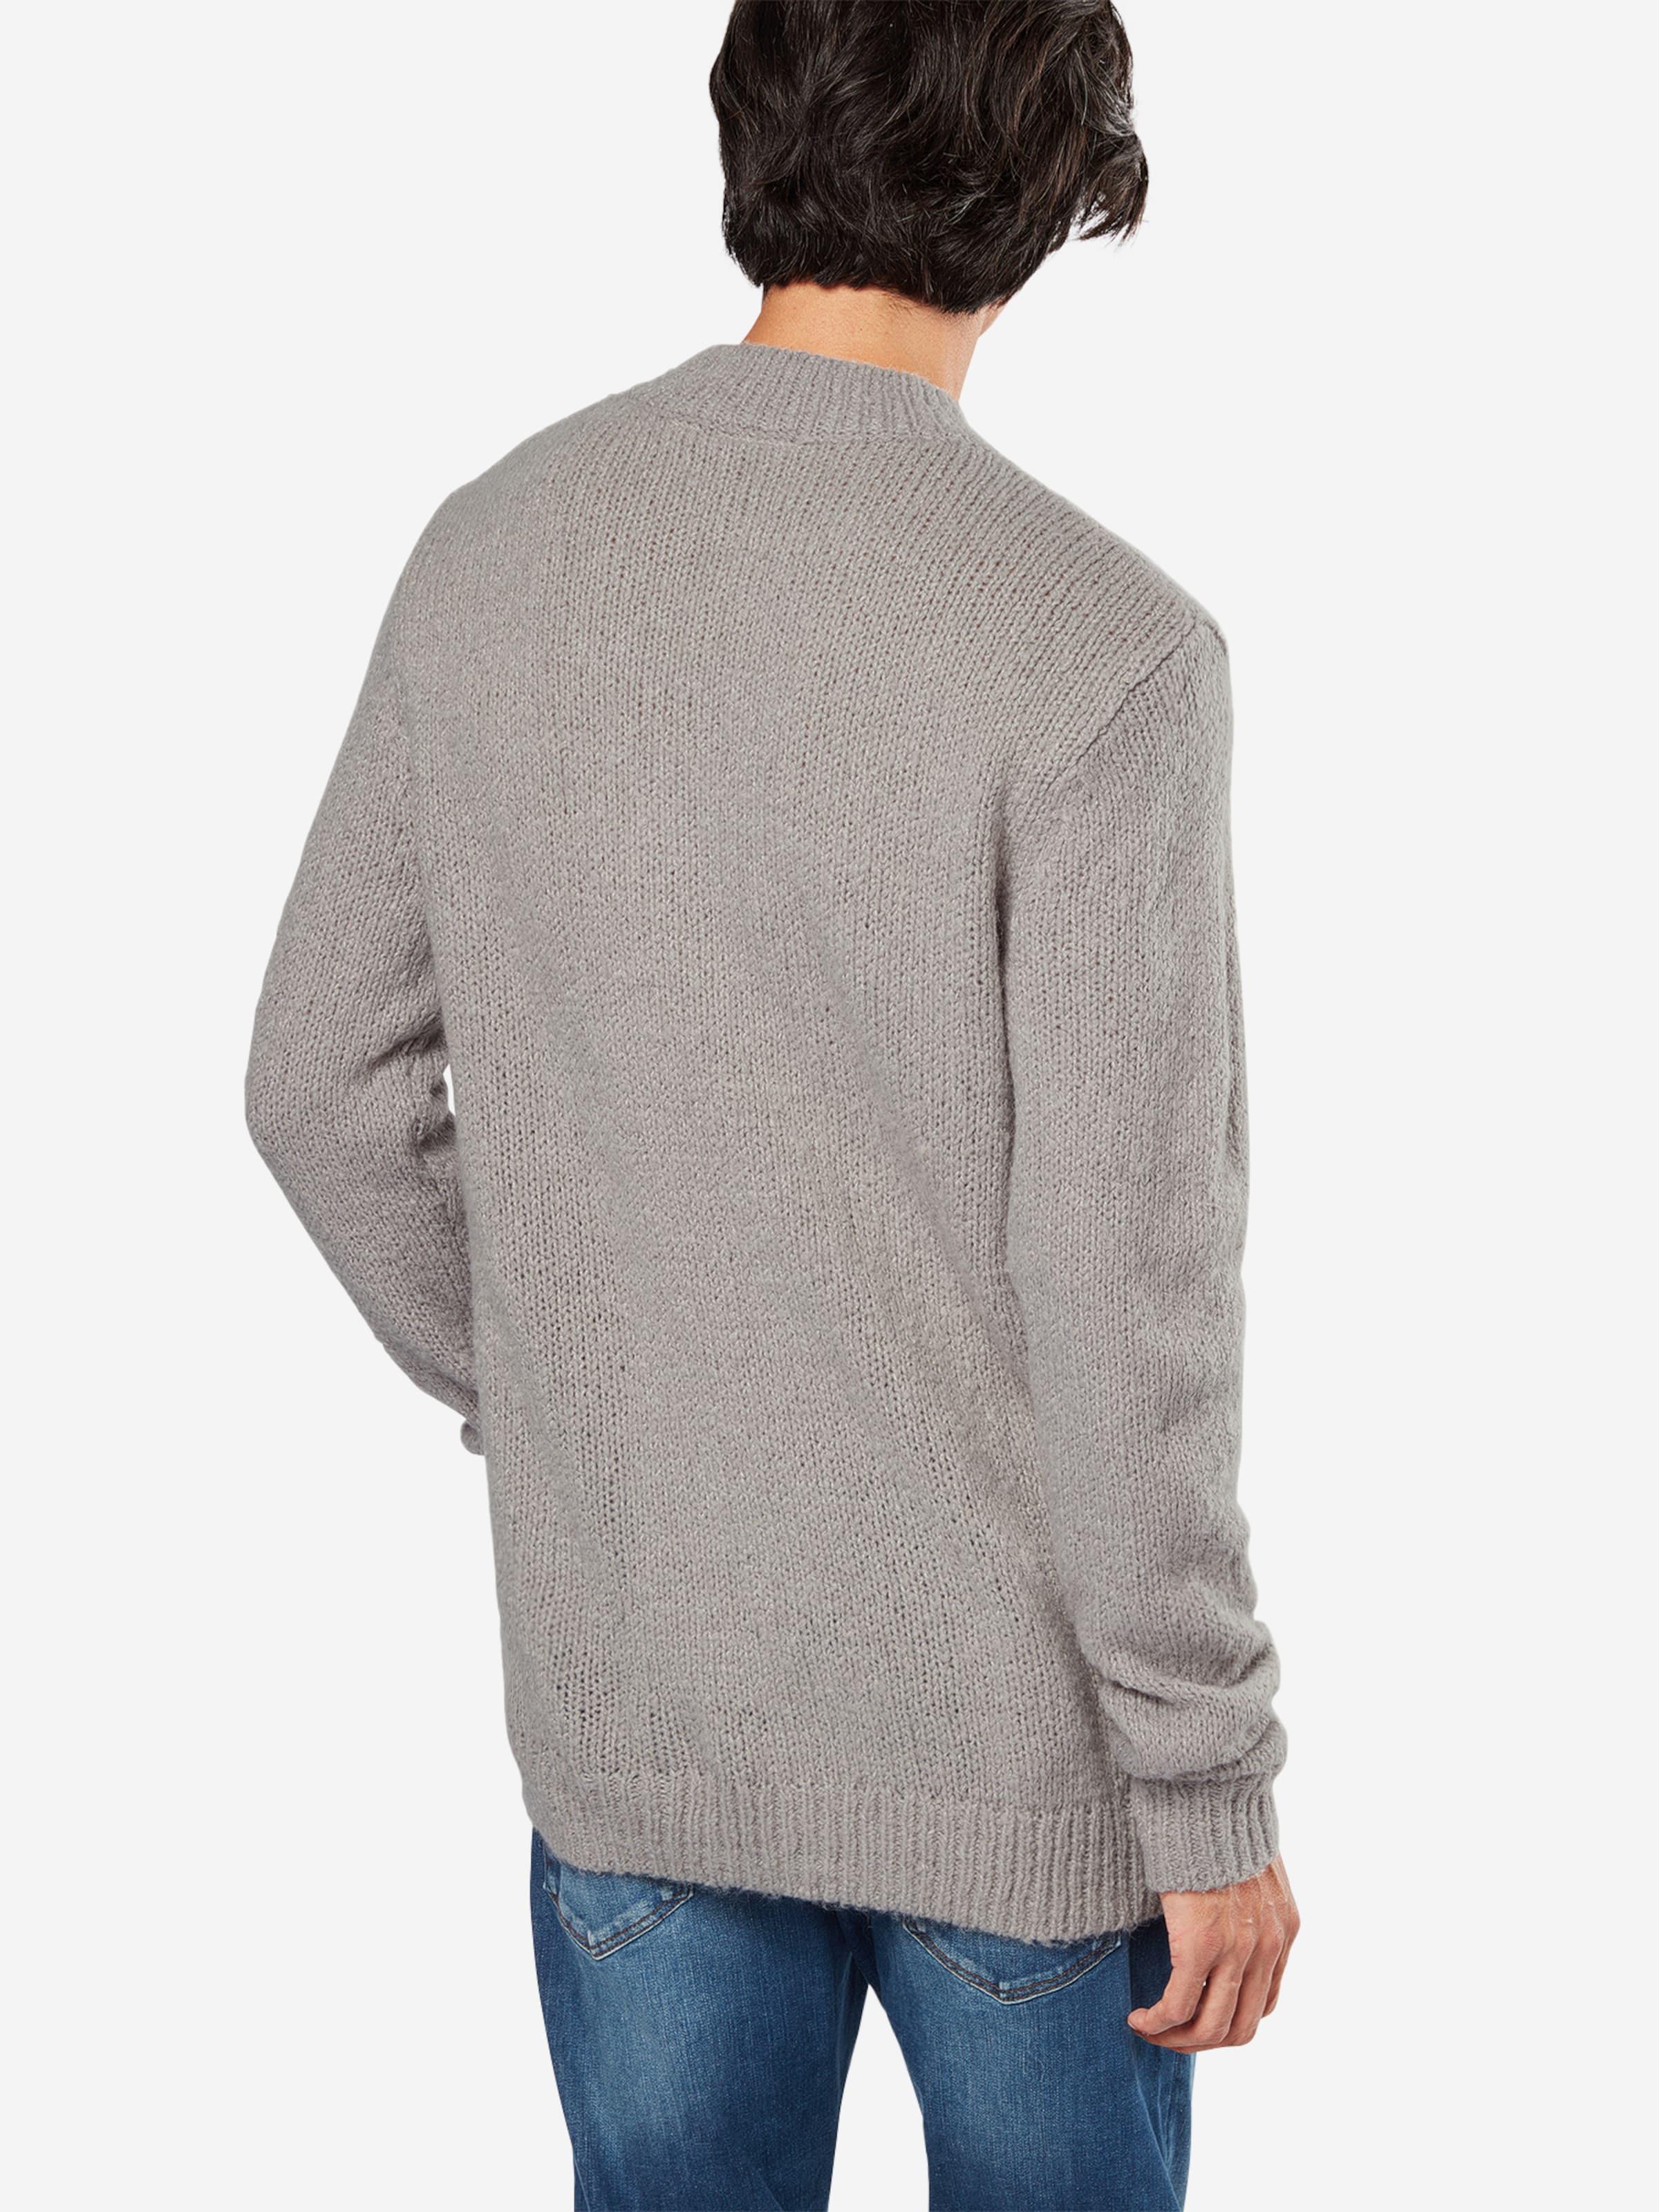 CHEAP MONDAY Pullover 'Challenge knit' Outlet Mode-Stil ux96FSx